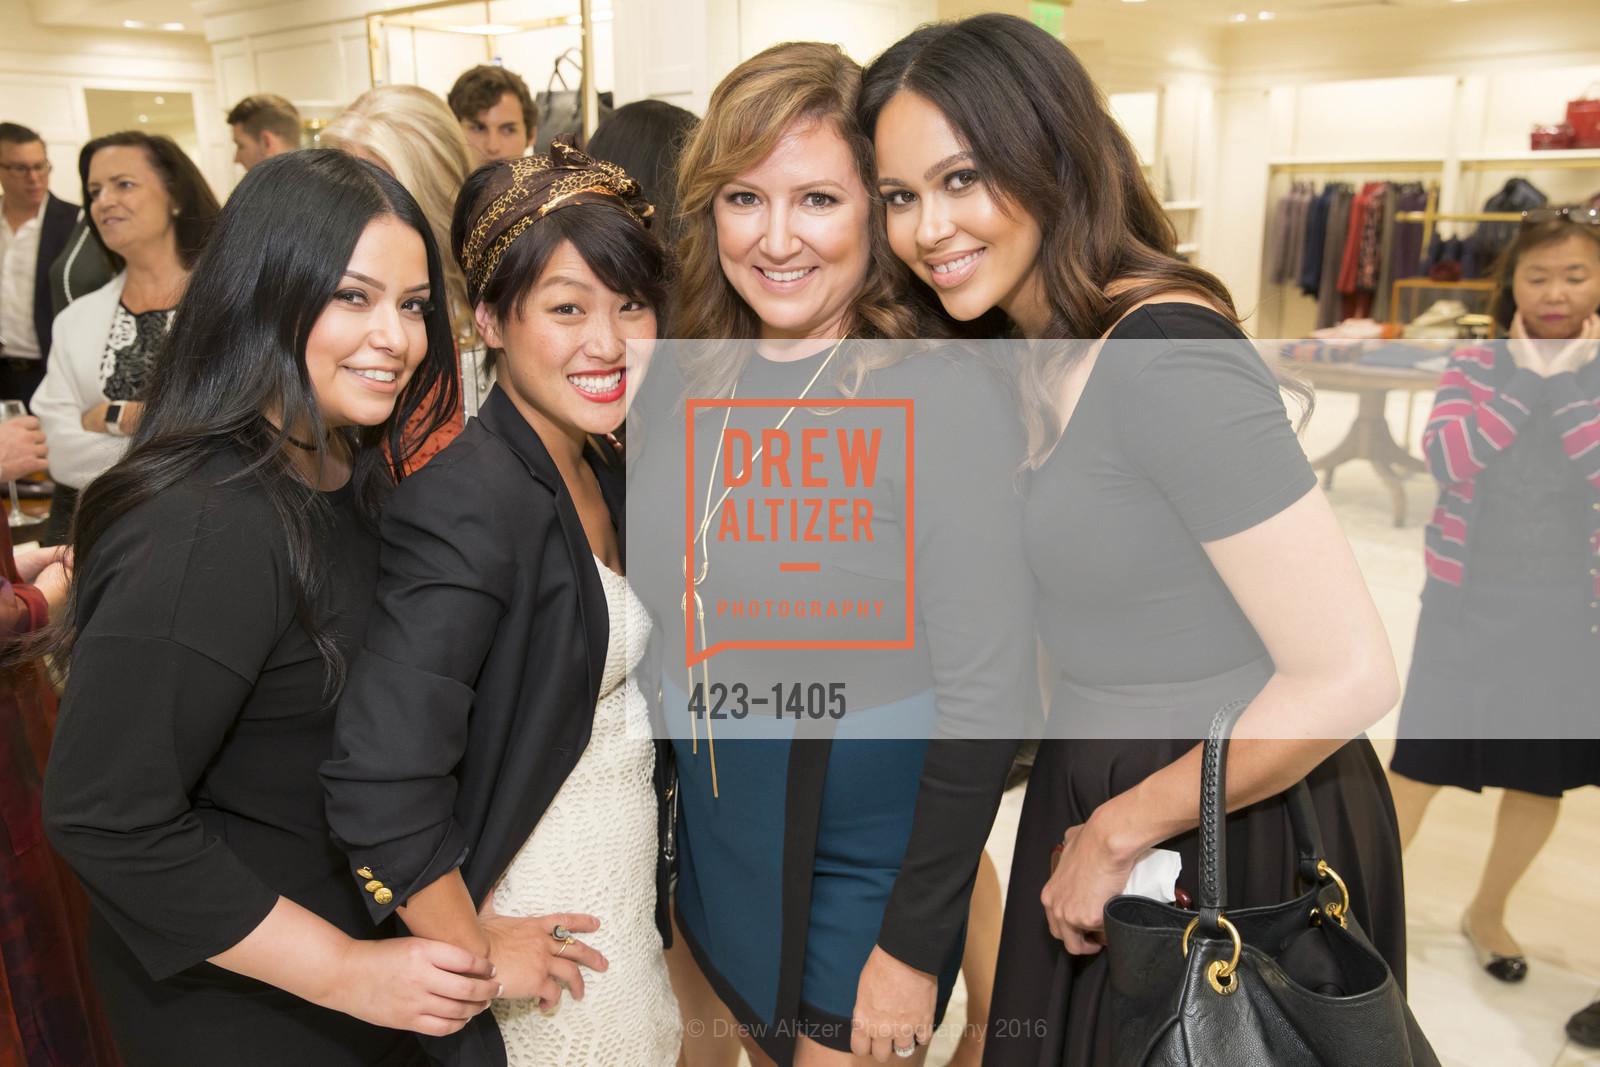 Bianca Ruby, CK Parkana, Jennifer Nagle, Lillian Jess, Photo #423-1405